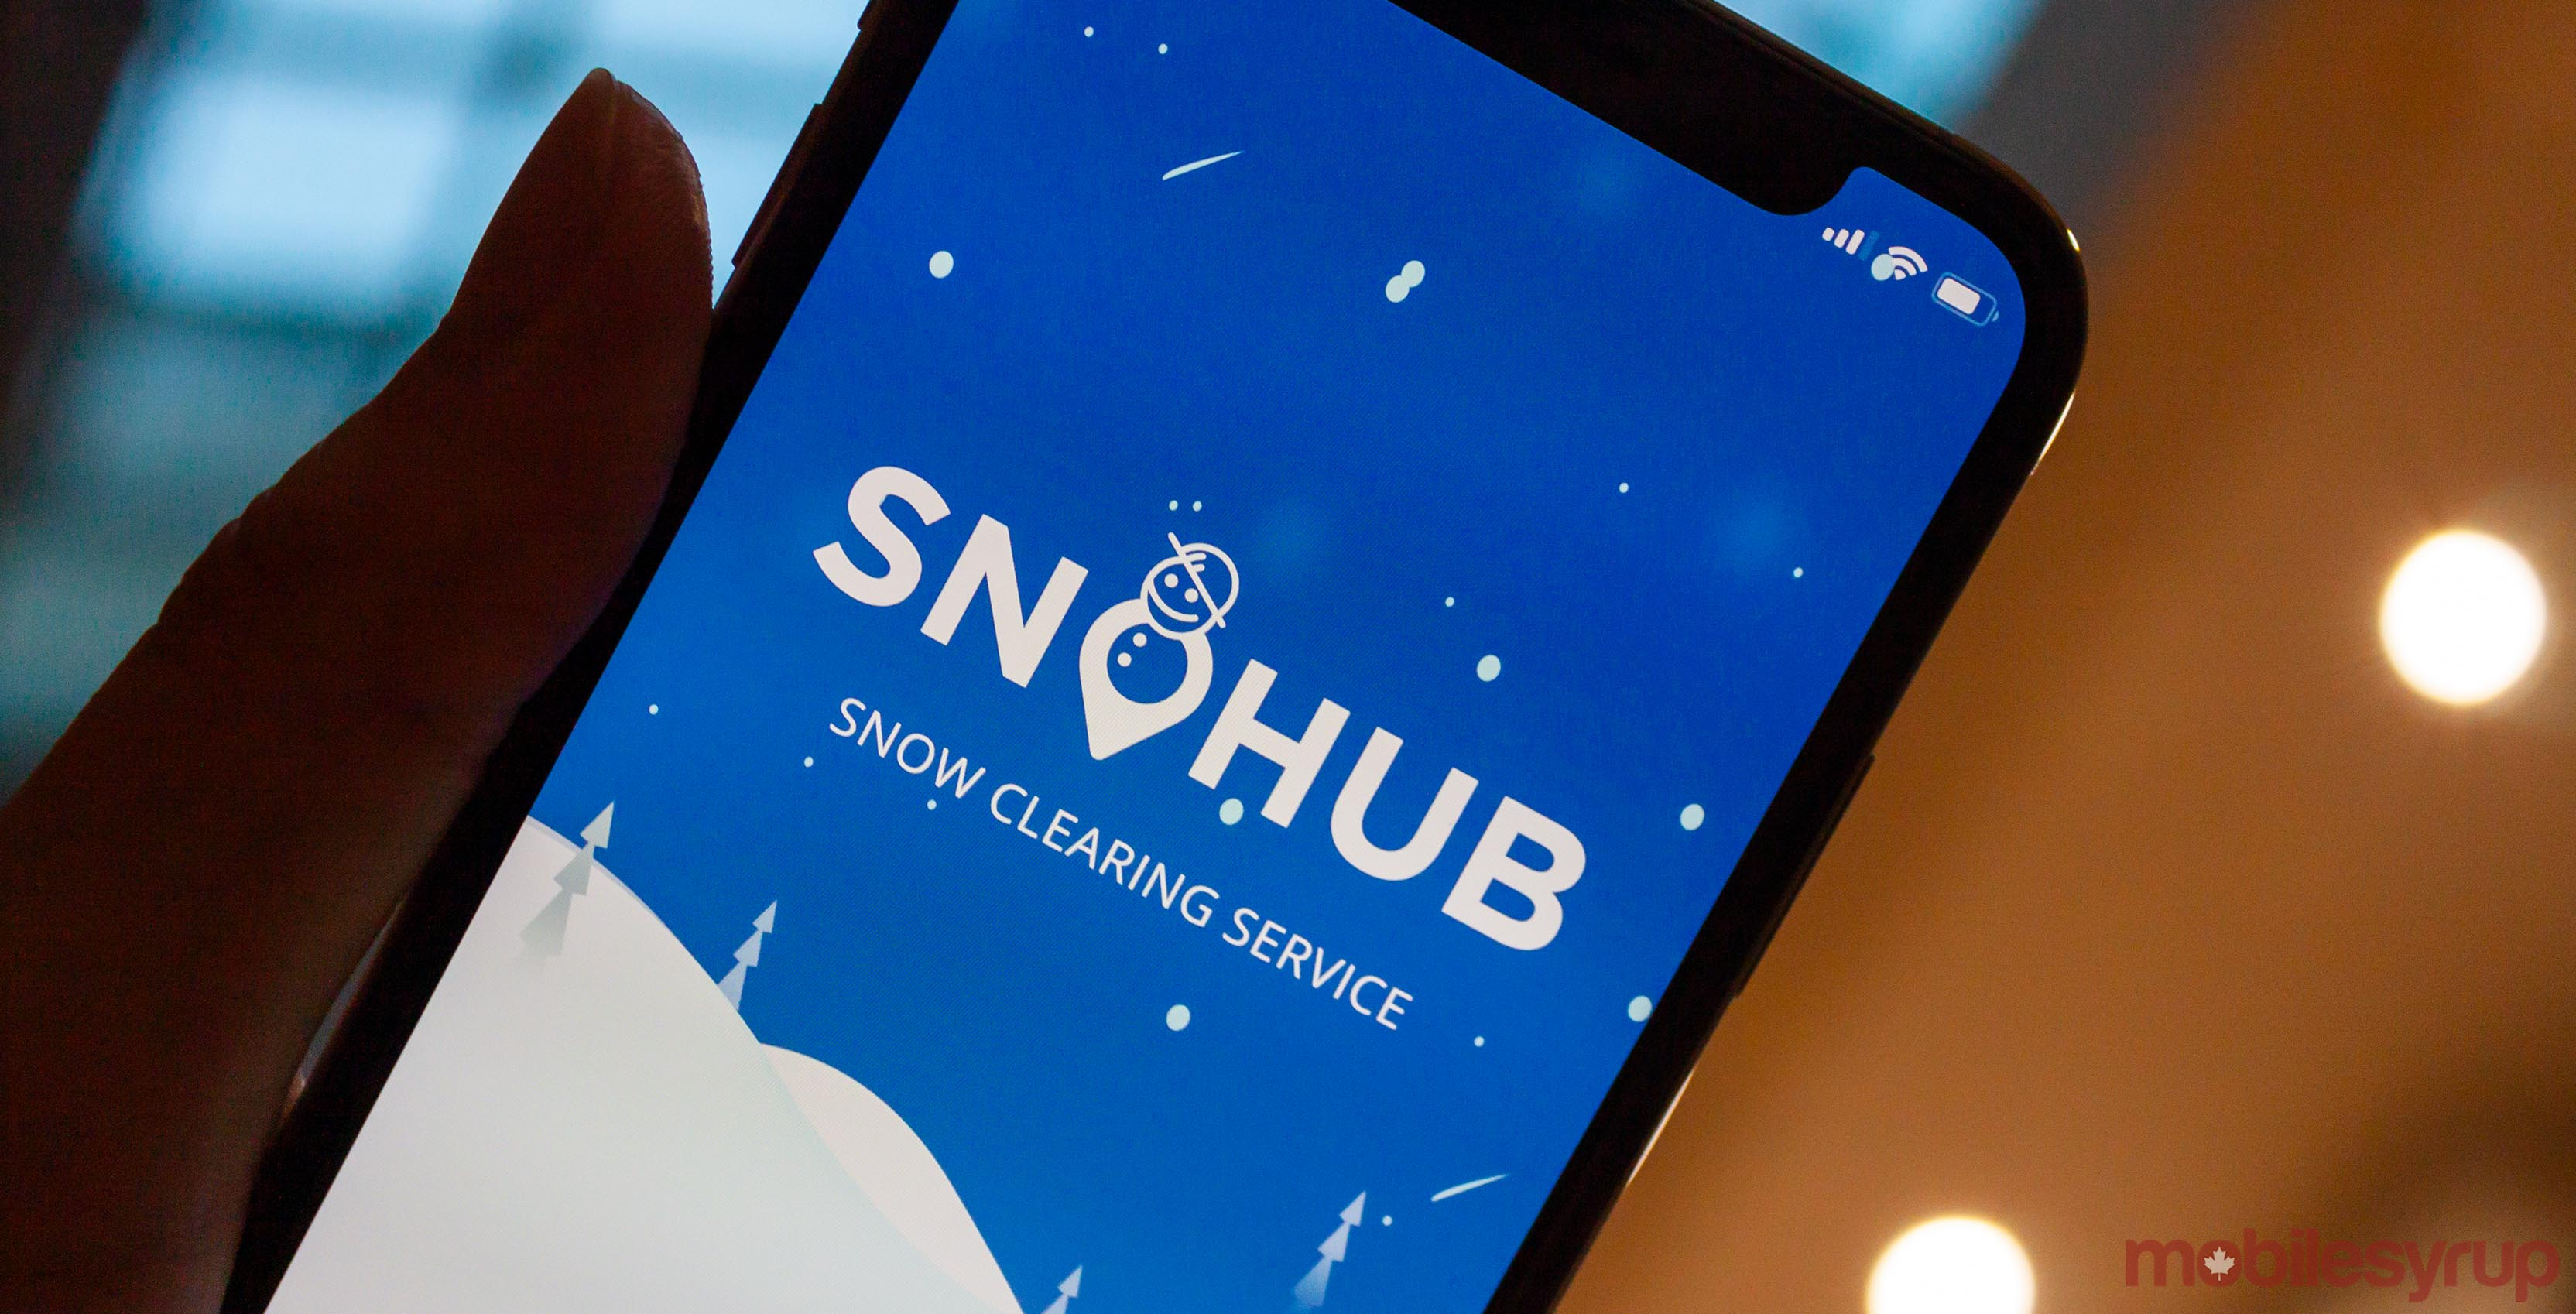 SnoHub app